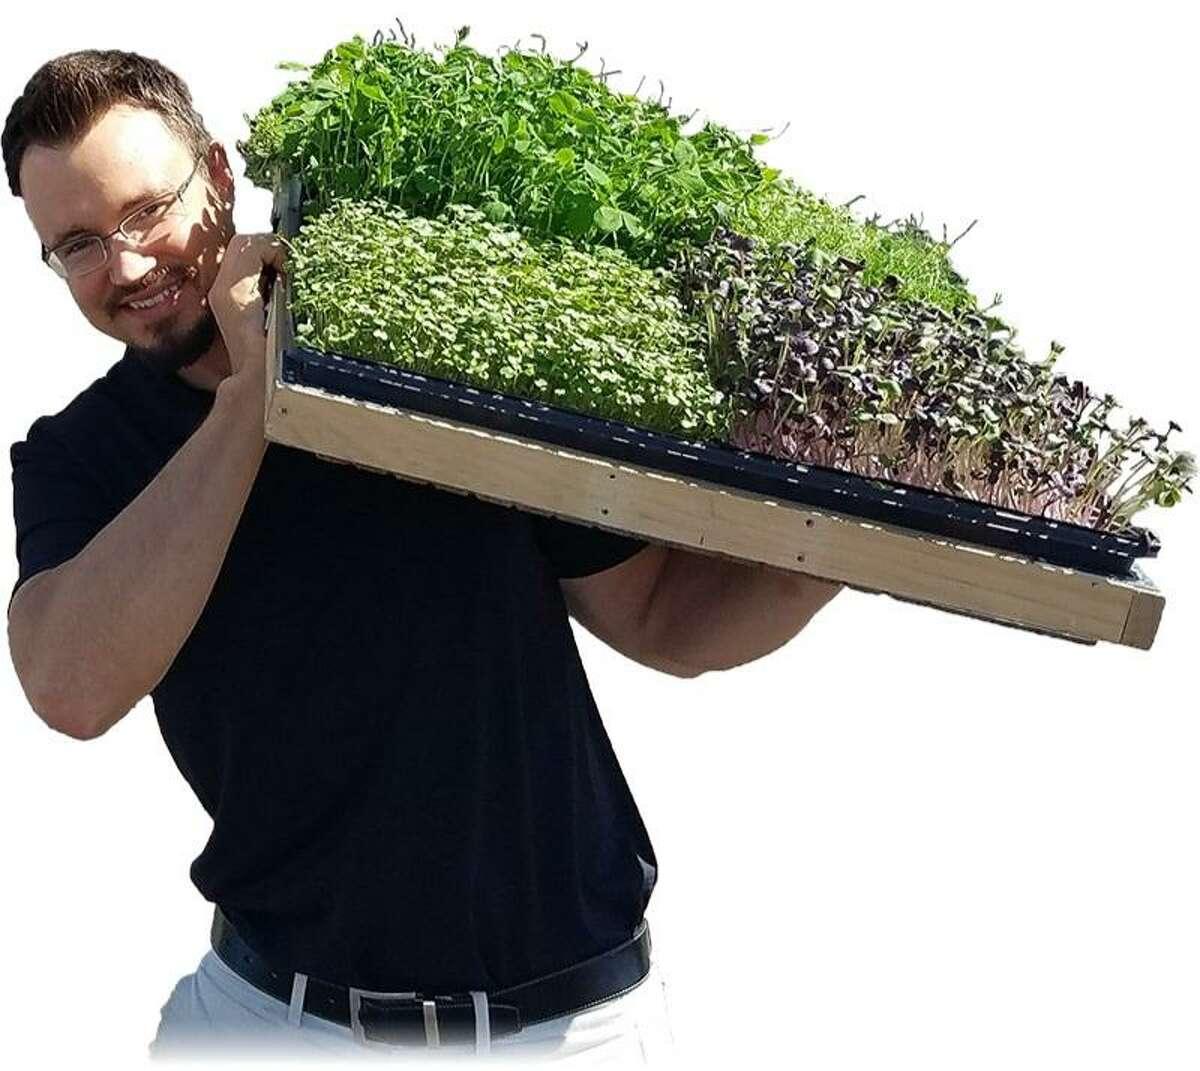 James Hinton is founder of Zero-Point Organics